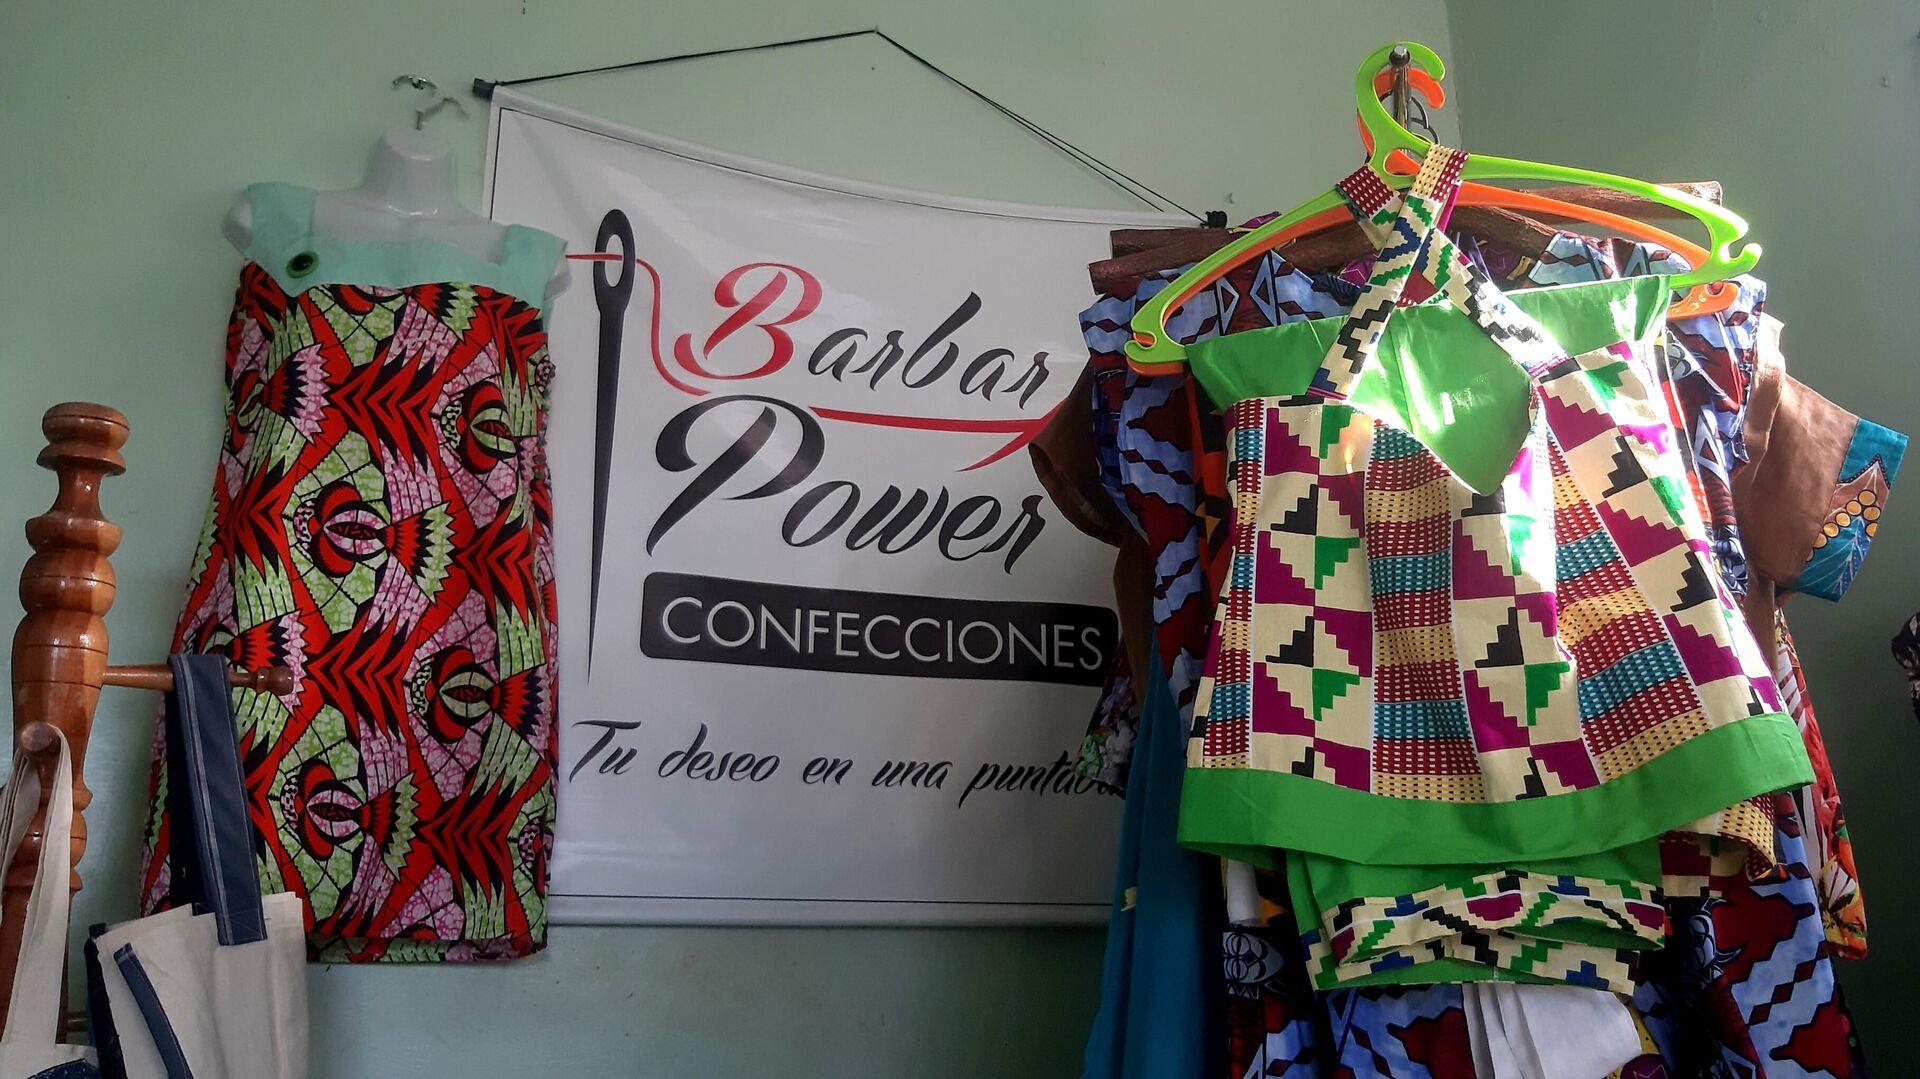 BarbarA's Power, la primera marca de ropa afro en Cuba - Sputnik Mundo, 1920, 24.05.2021